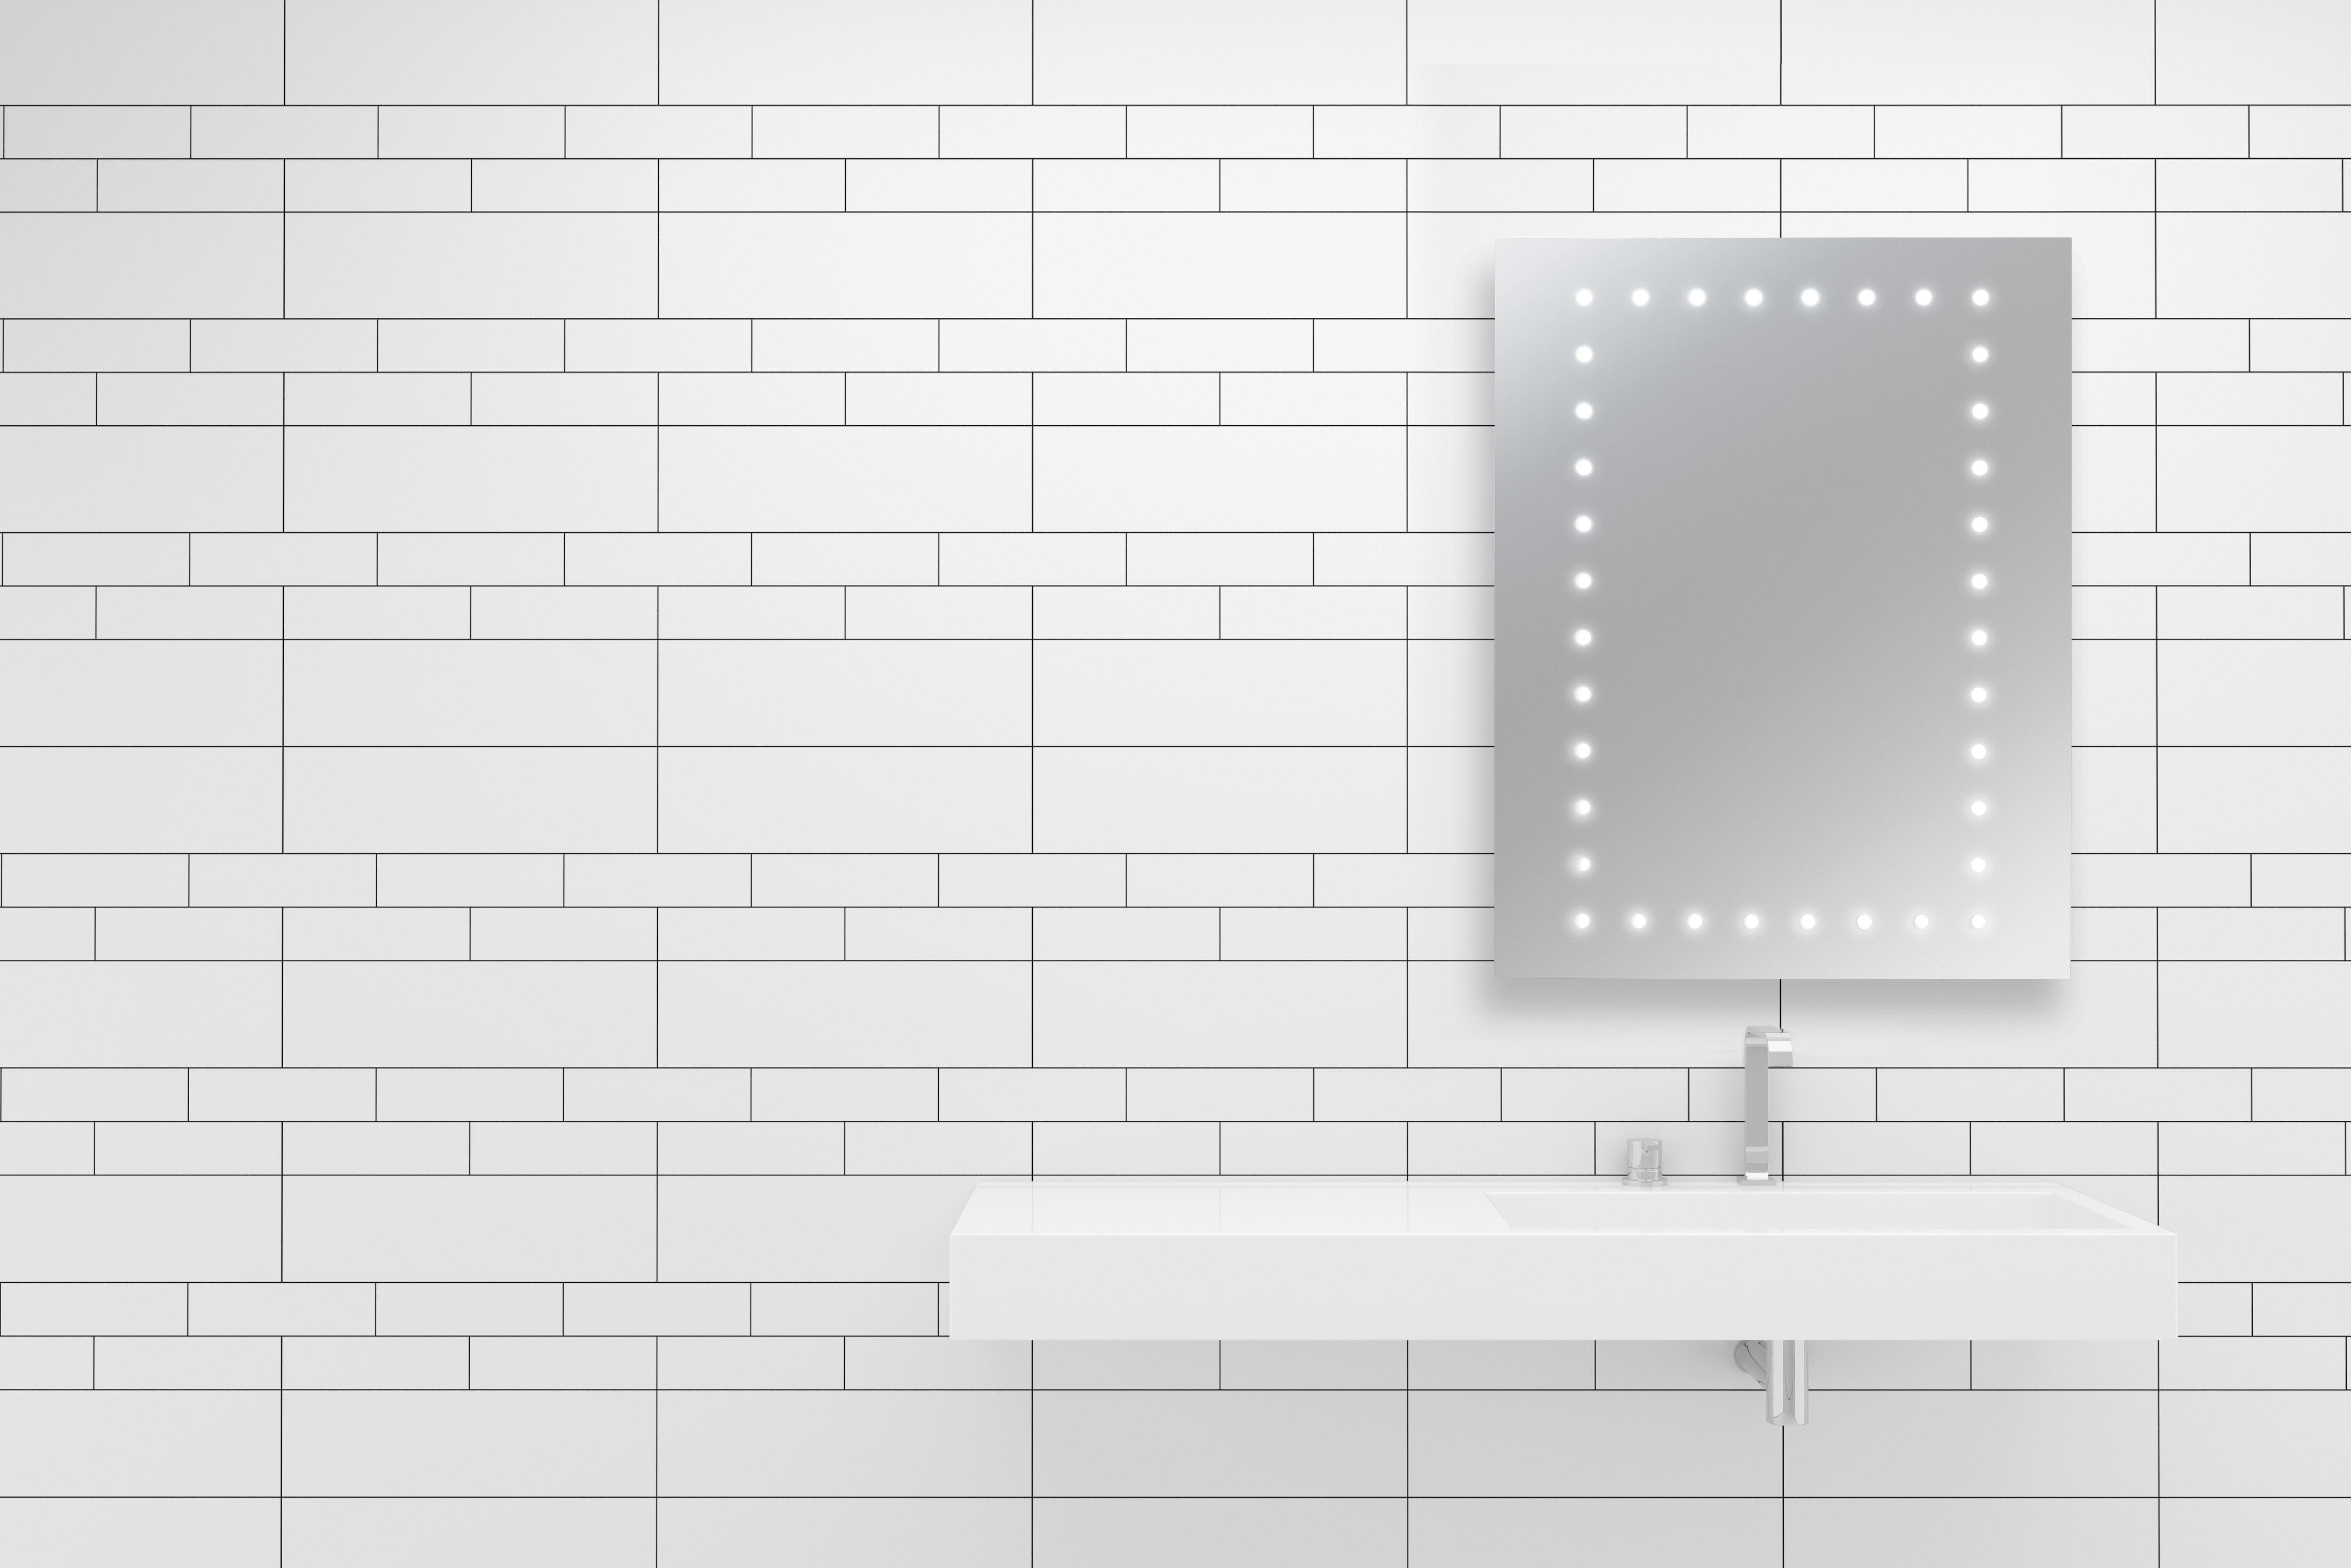 Bathroom Mirror Java ip44 bathroom mirror with perimeter leds - leyton lighting